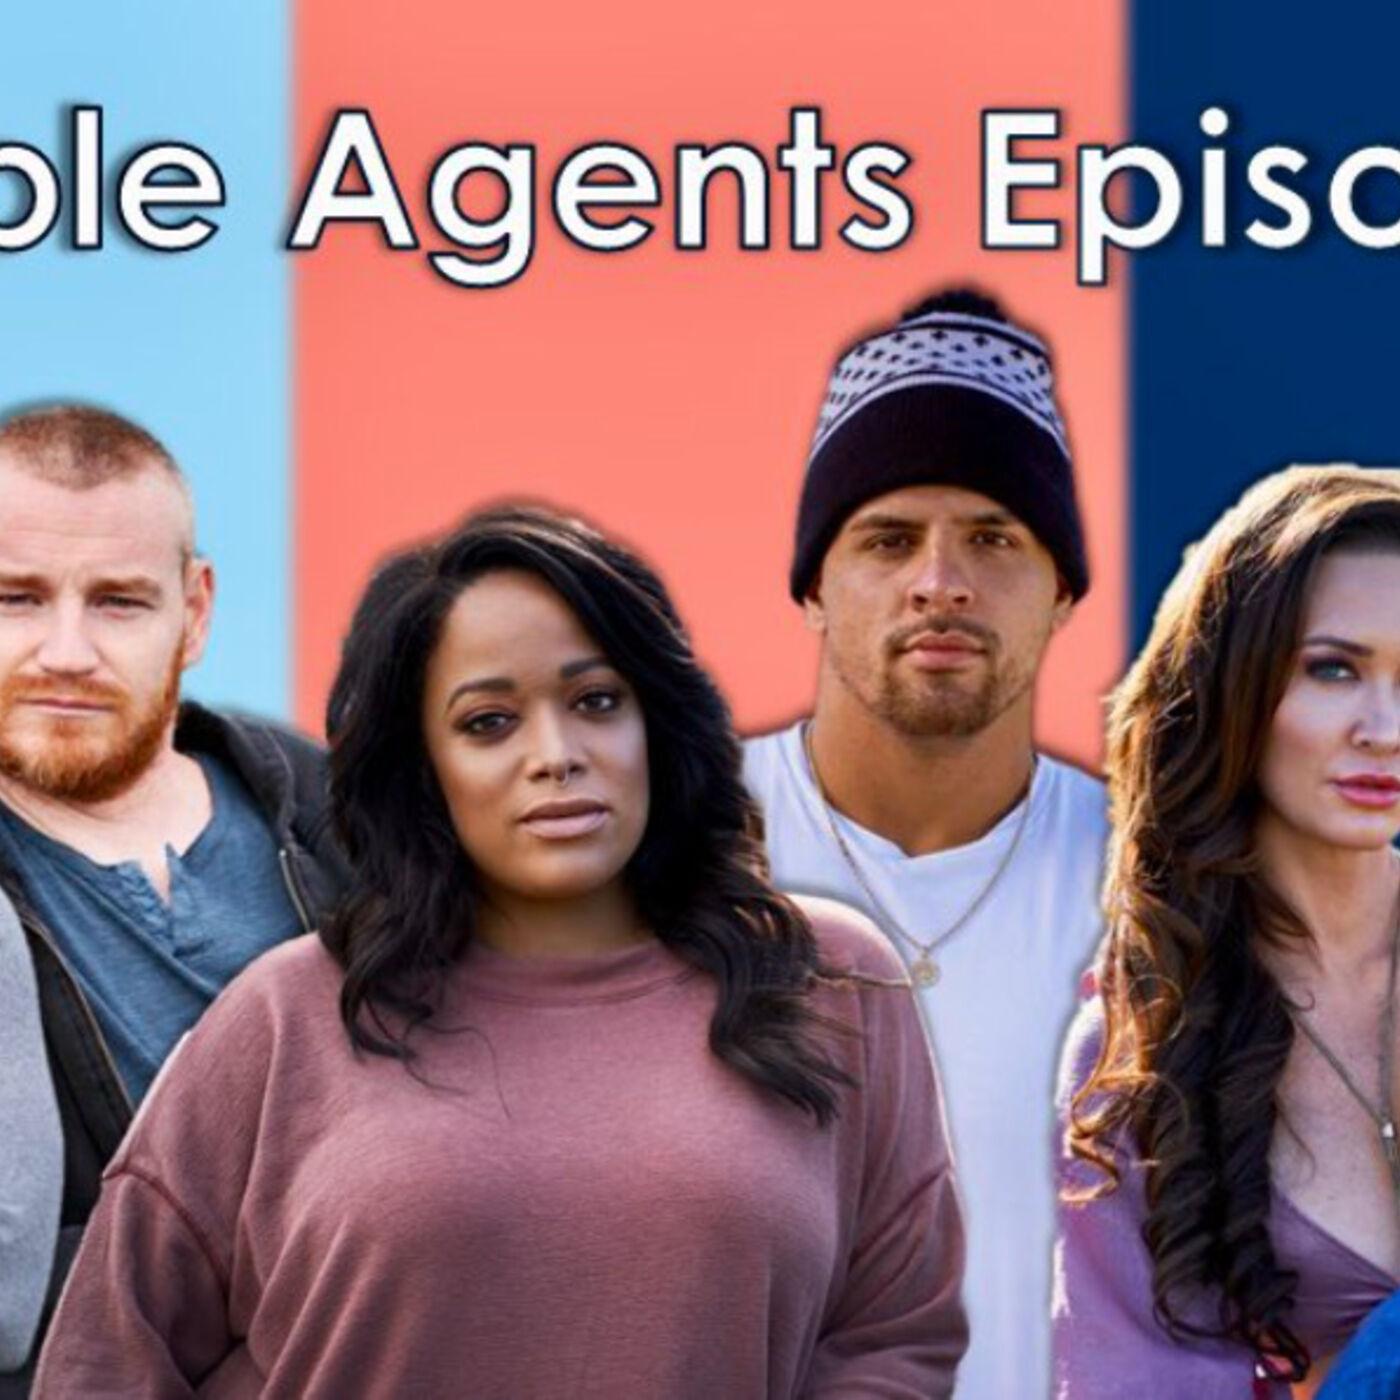 Challenge Double Agents Episode 1 Recap: A Feast of Champions